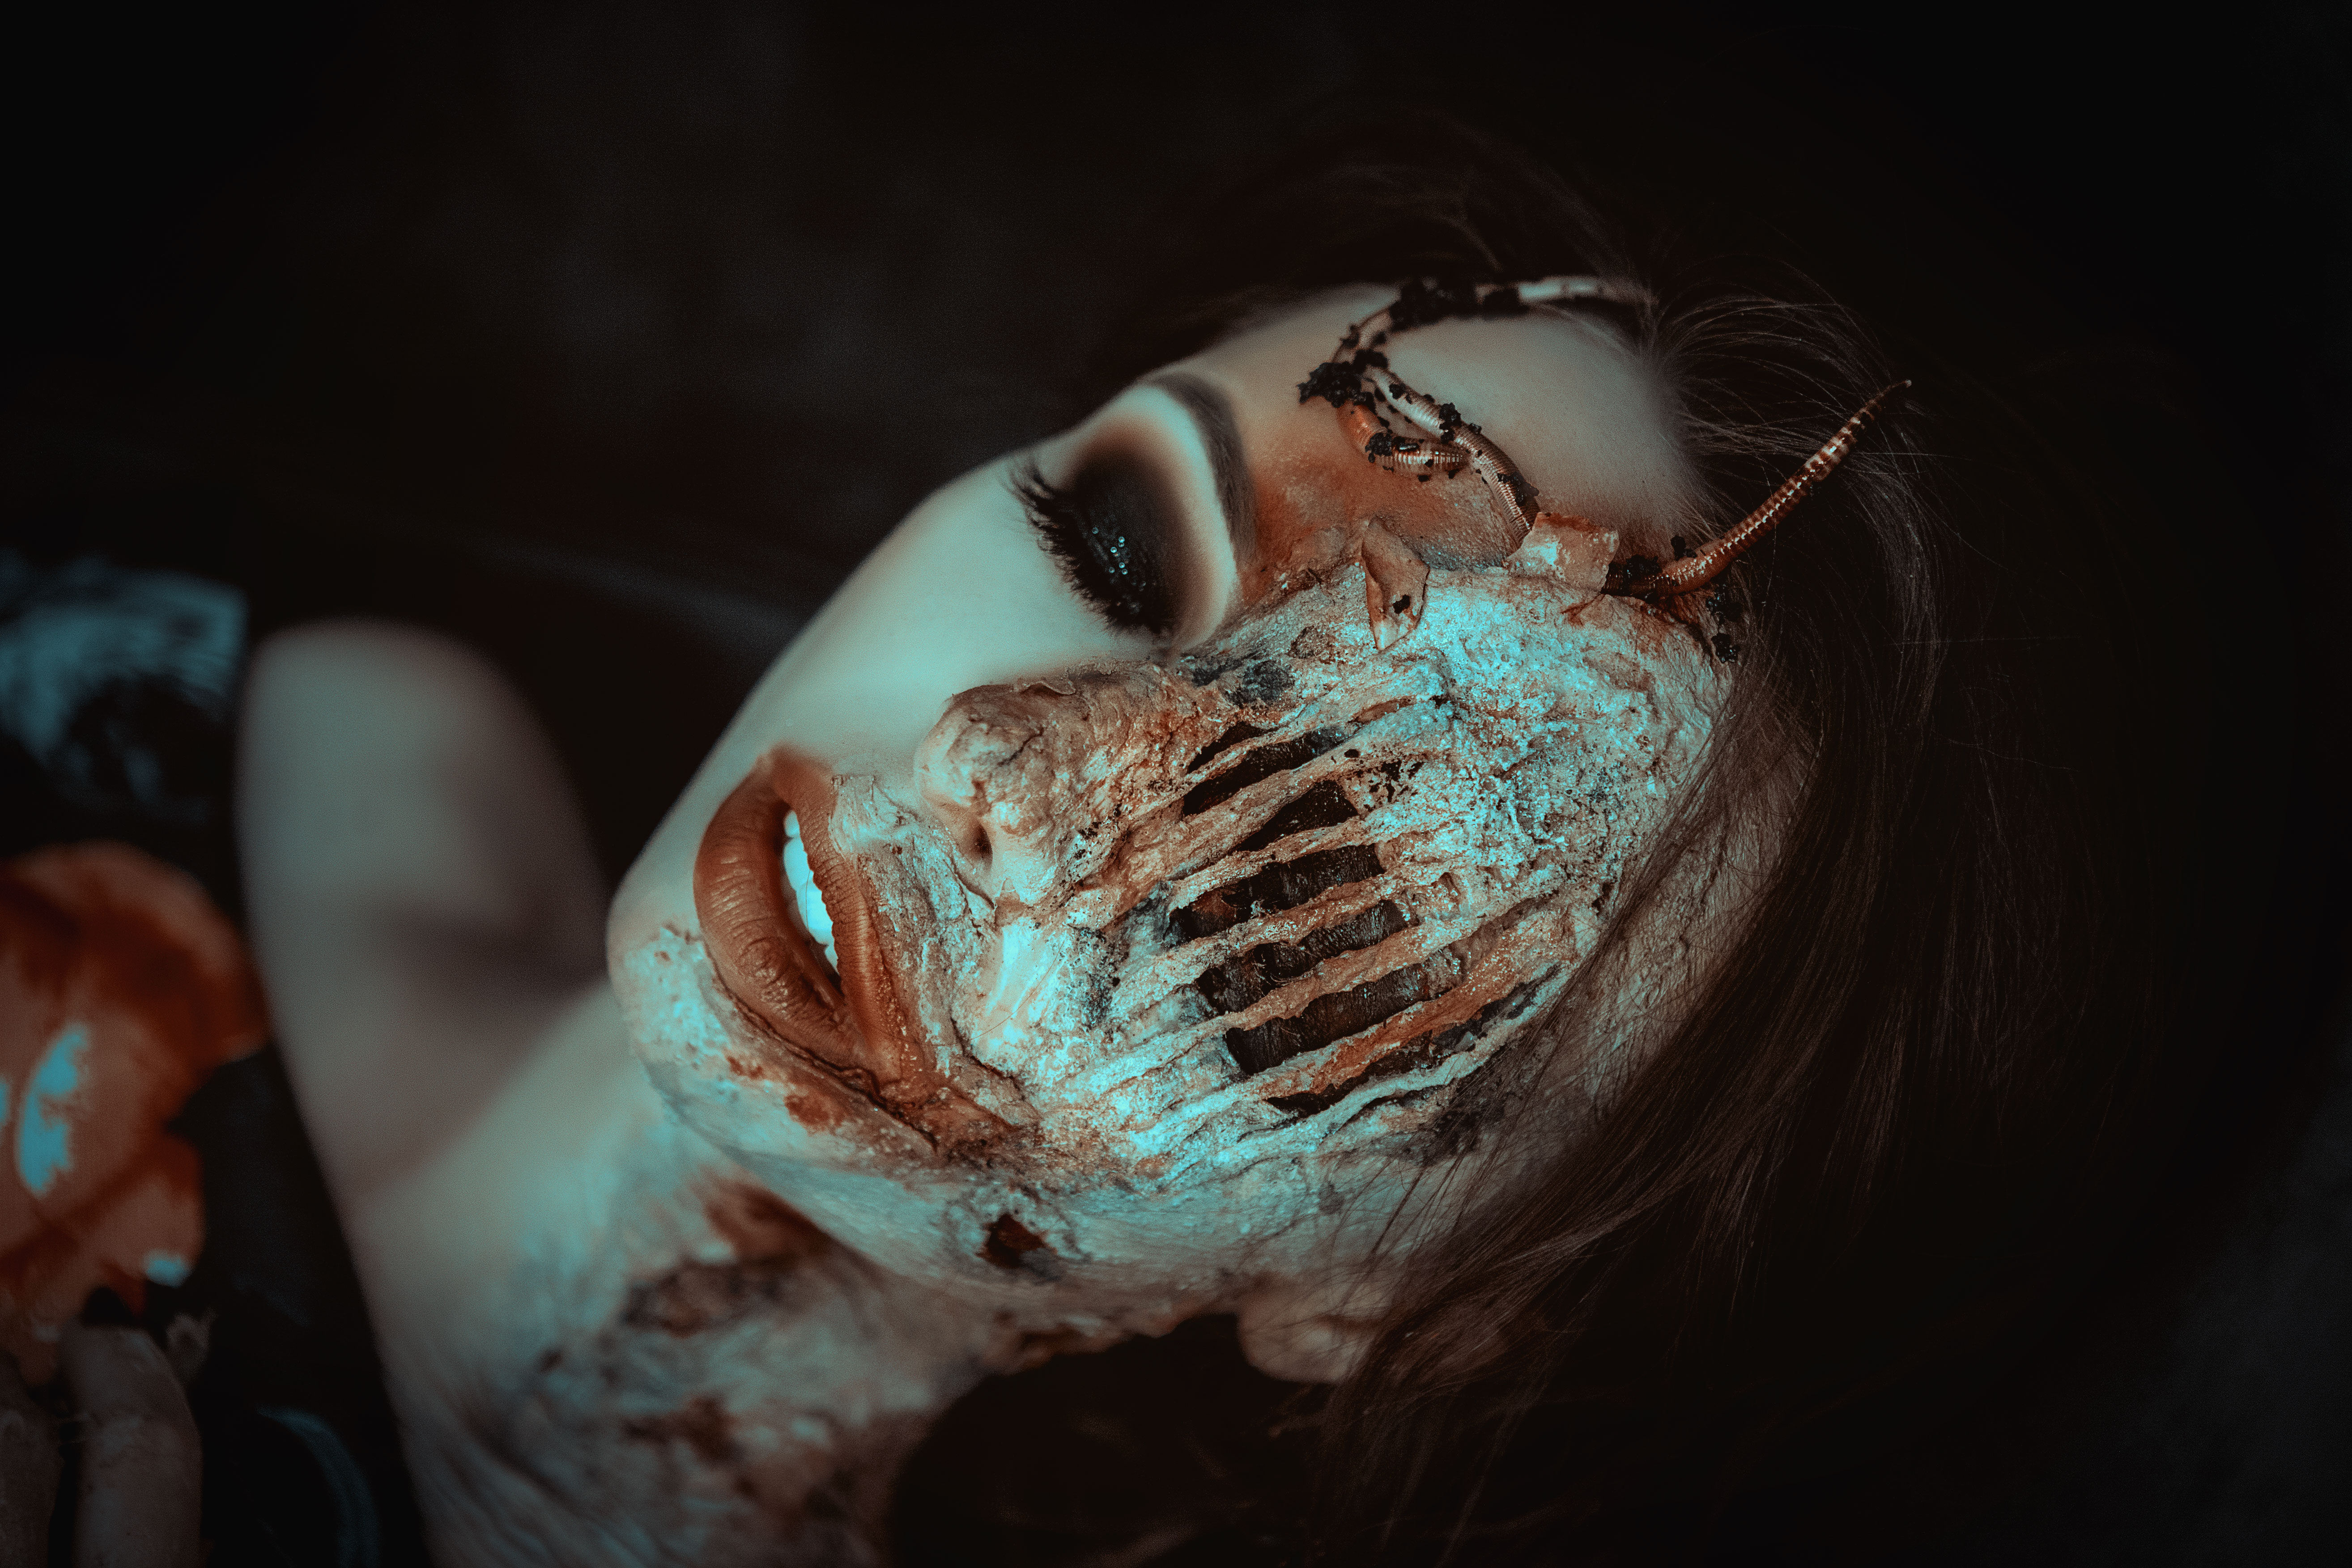 Immortal, warms, death, dead, beauty, goth, gothic, Клио Катерина